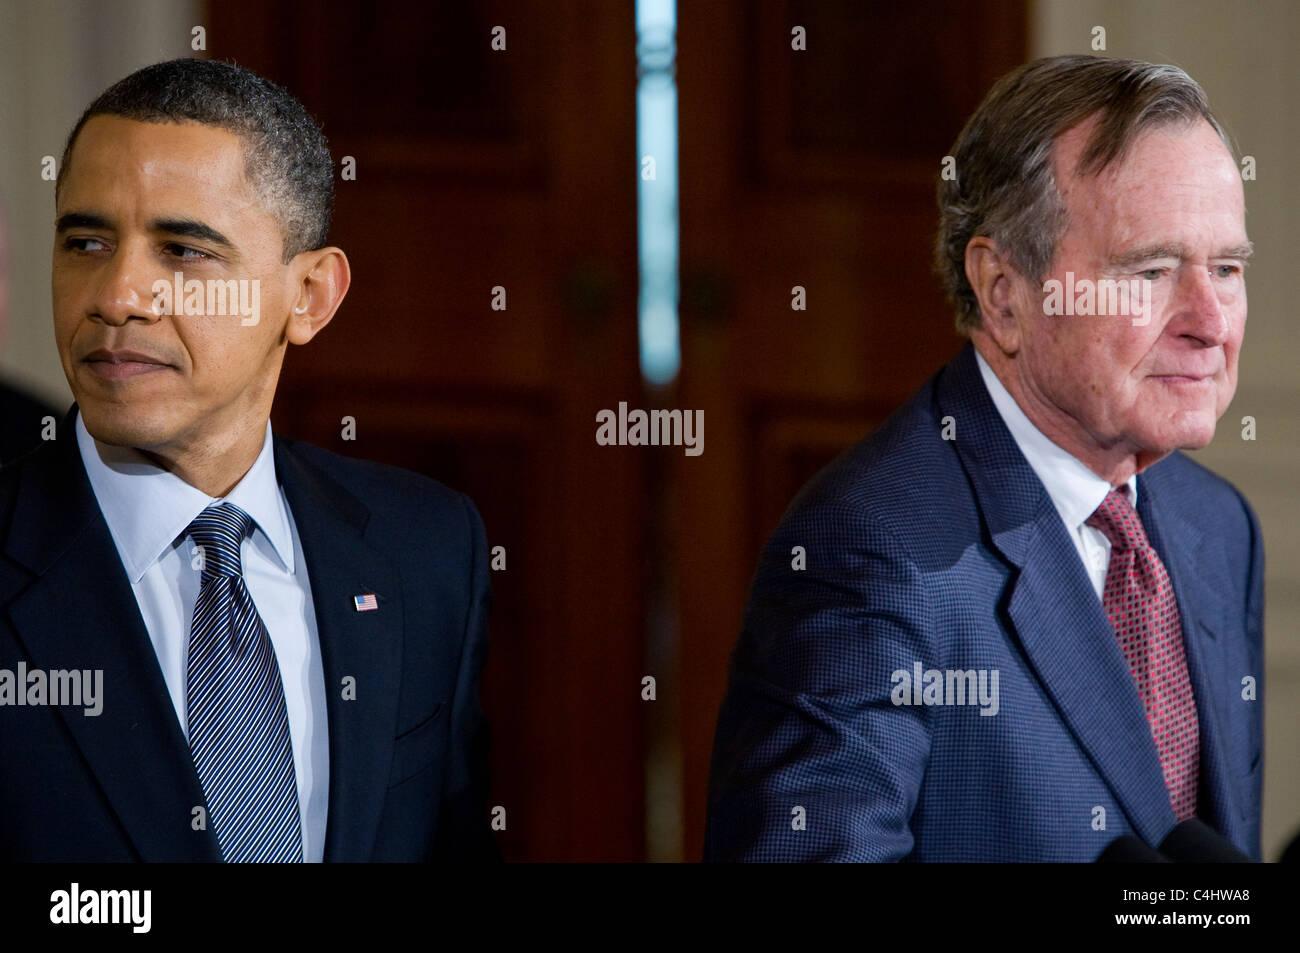 President Barack Obama presents the Presidential Medal of Freedom to former President George H.W. Bush. - Stock Image